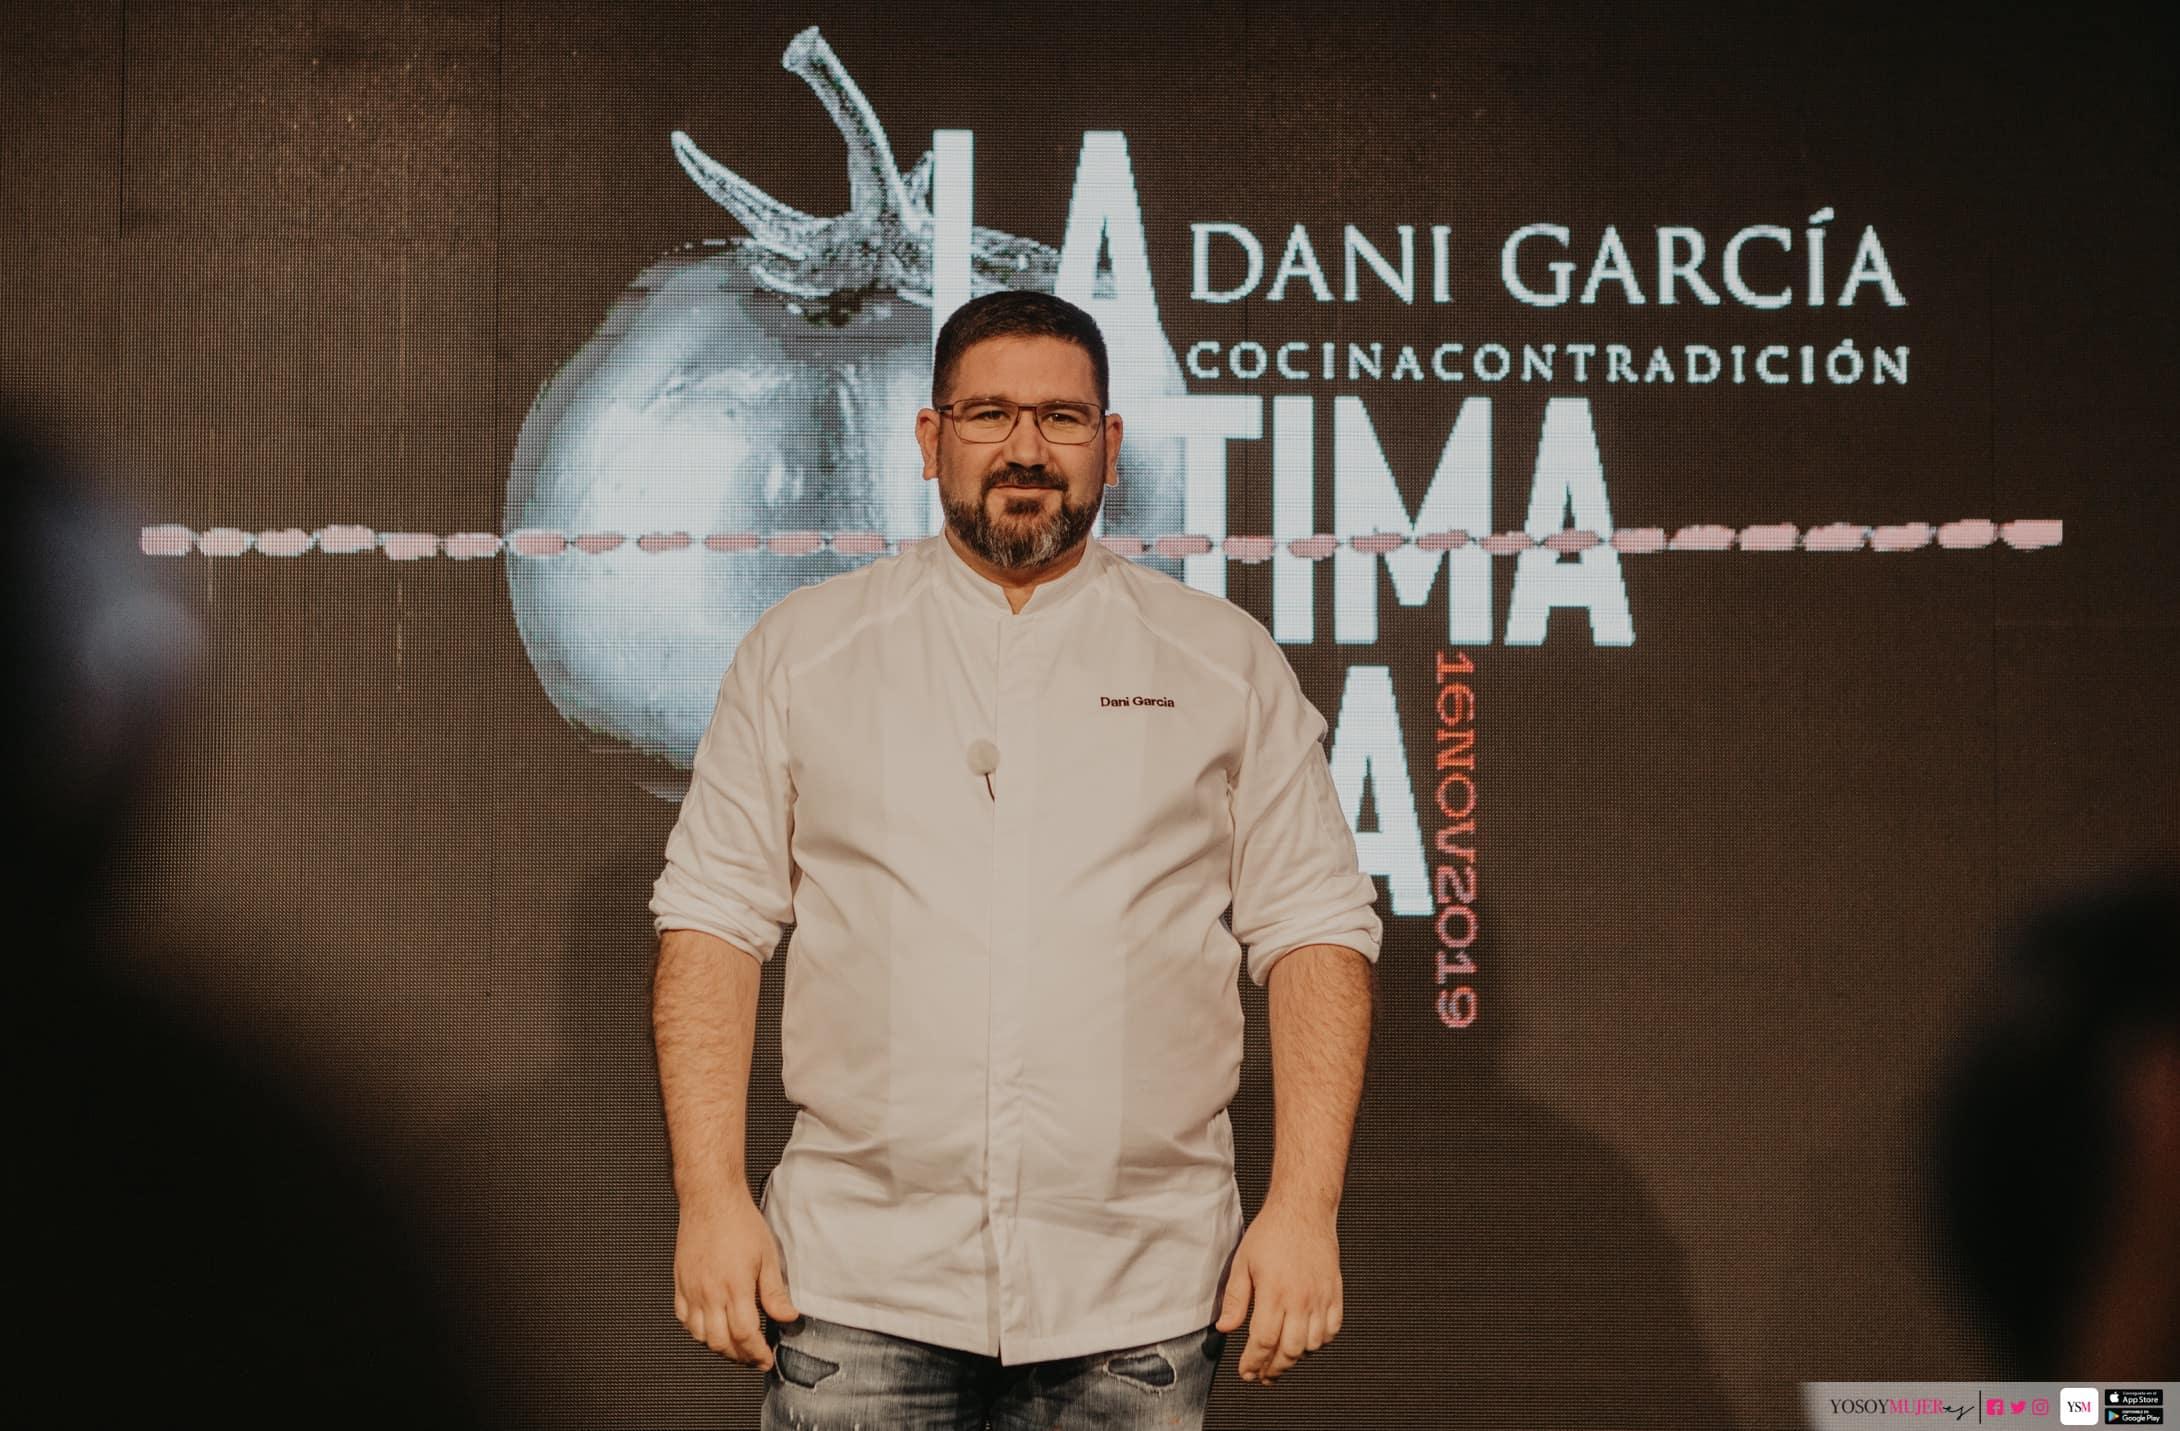 Dani García